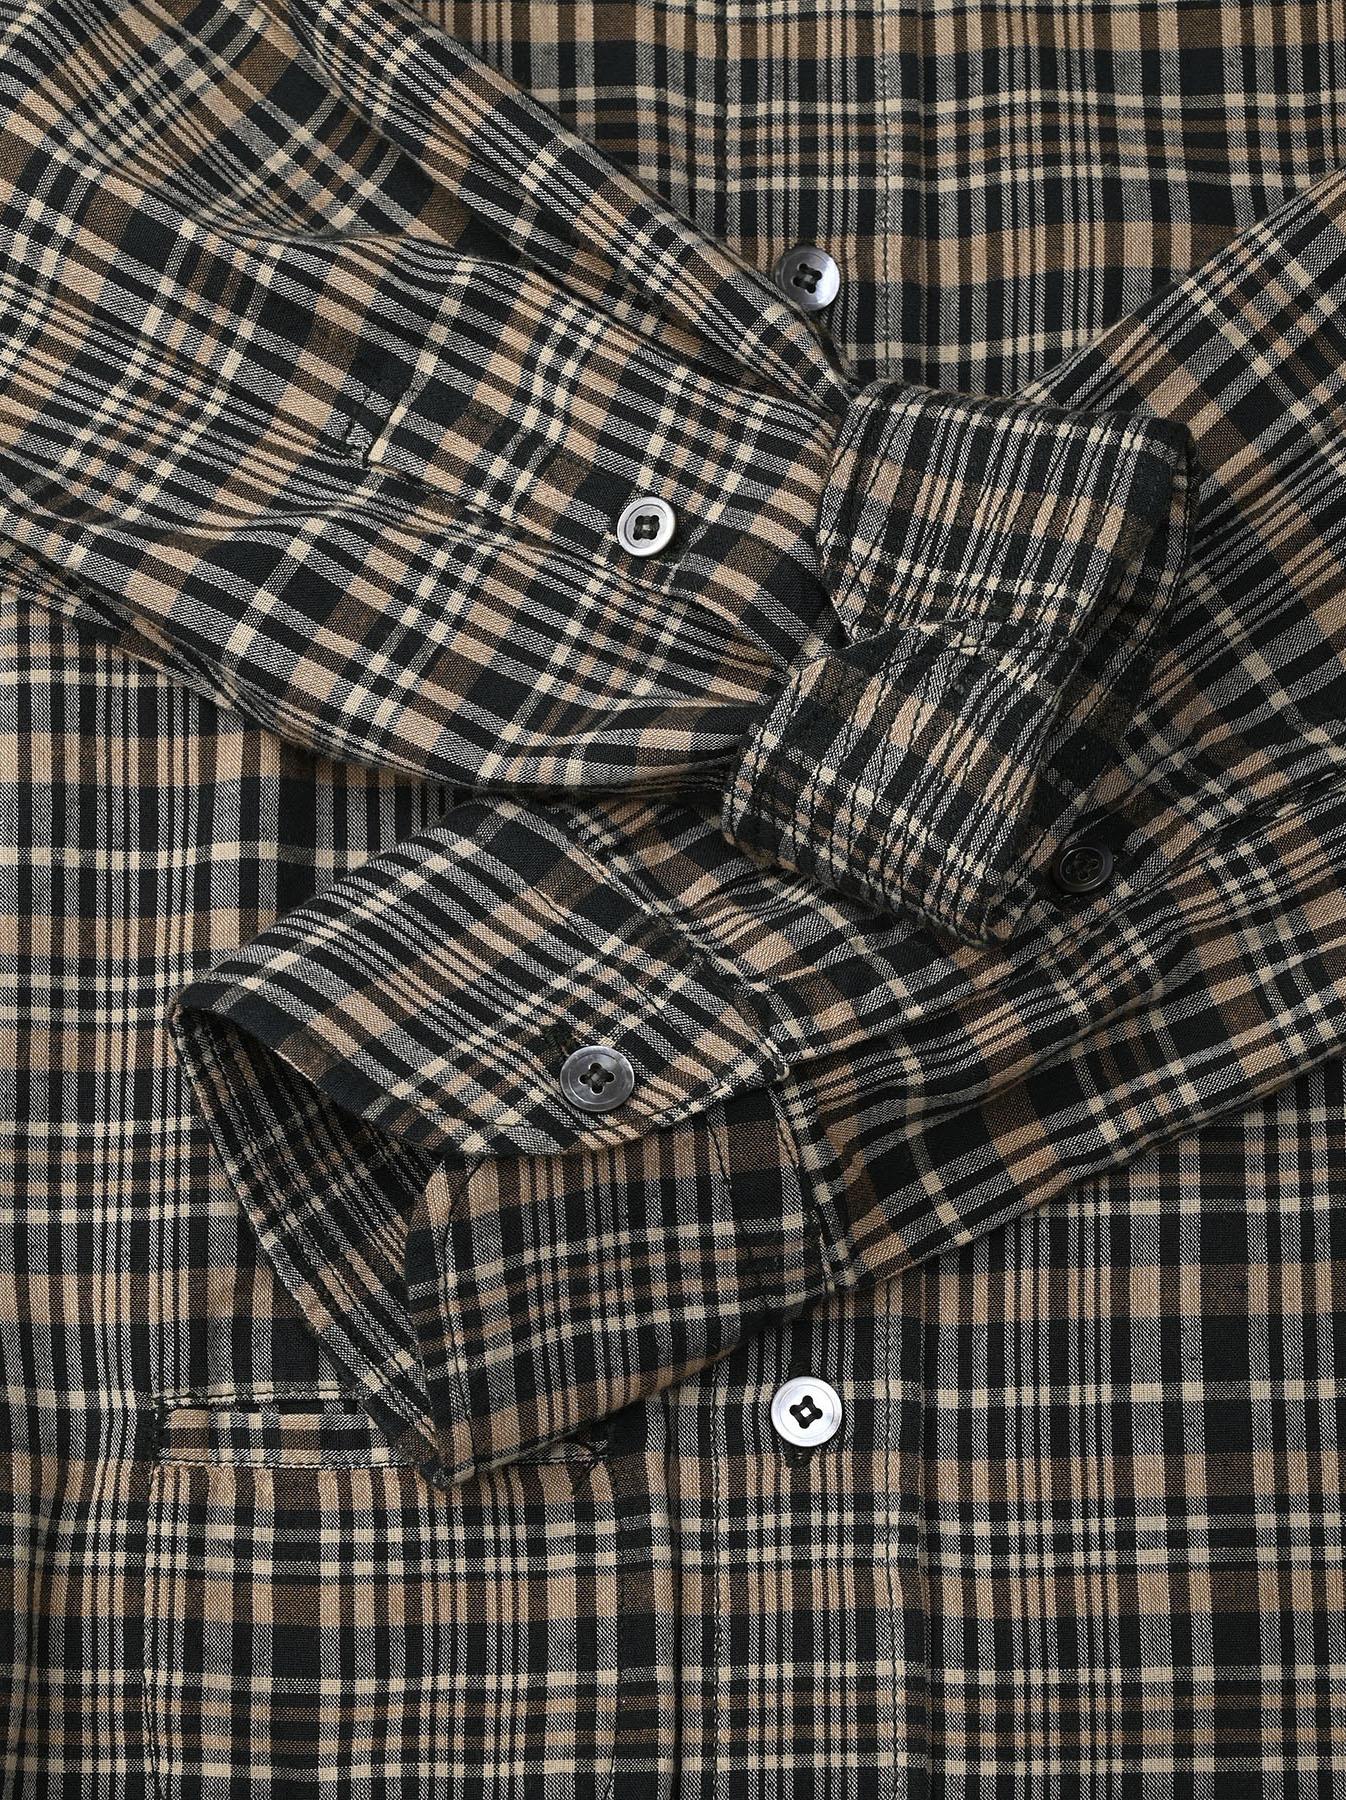 Indian Mugi-hira 908 Ocean Button Down Shirt (0421)-12